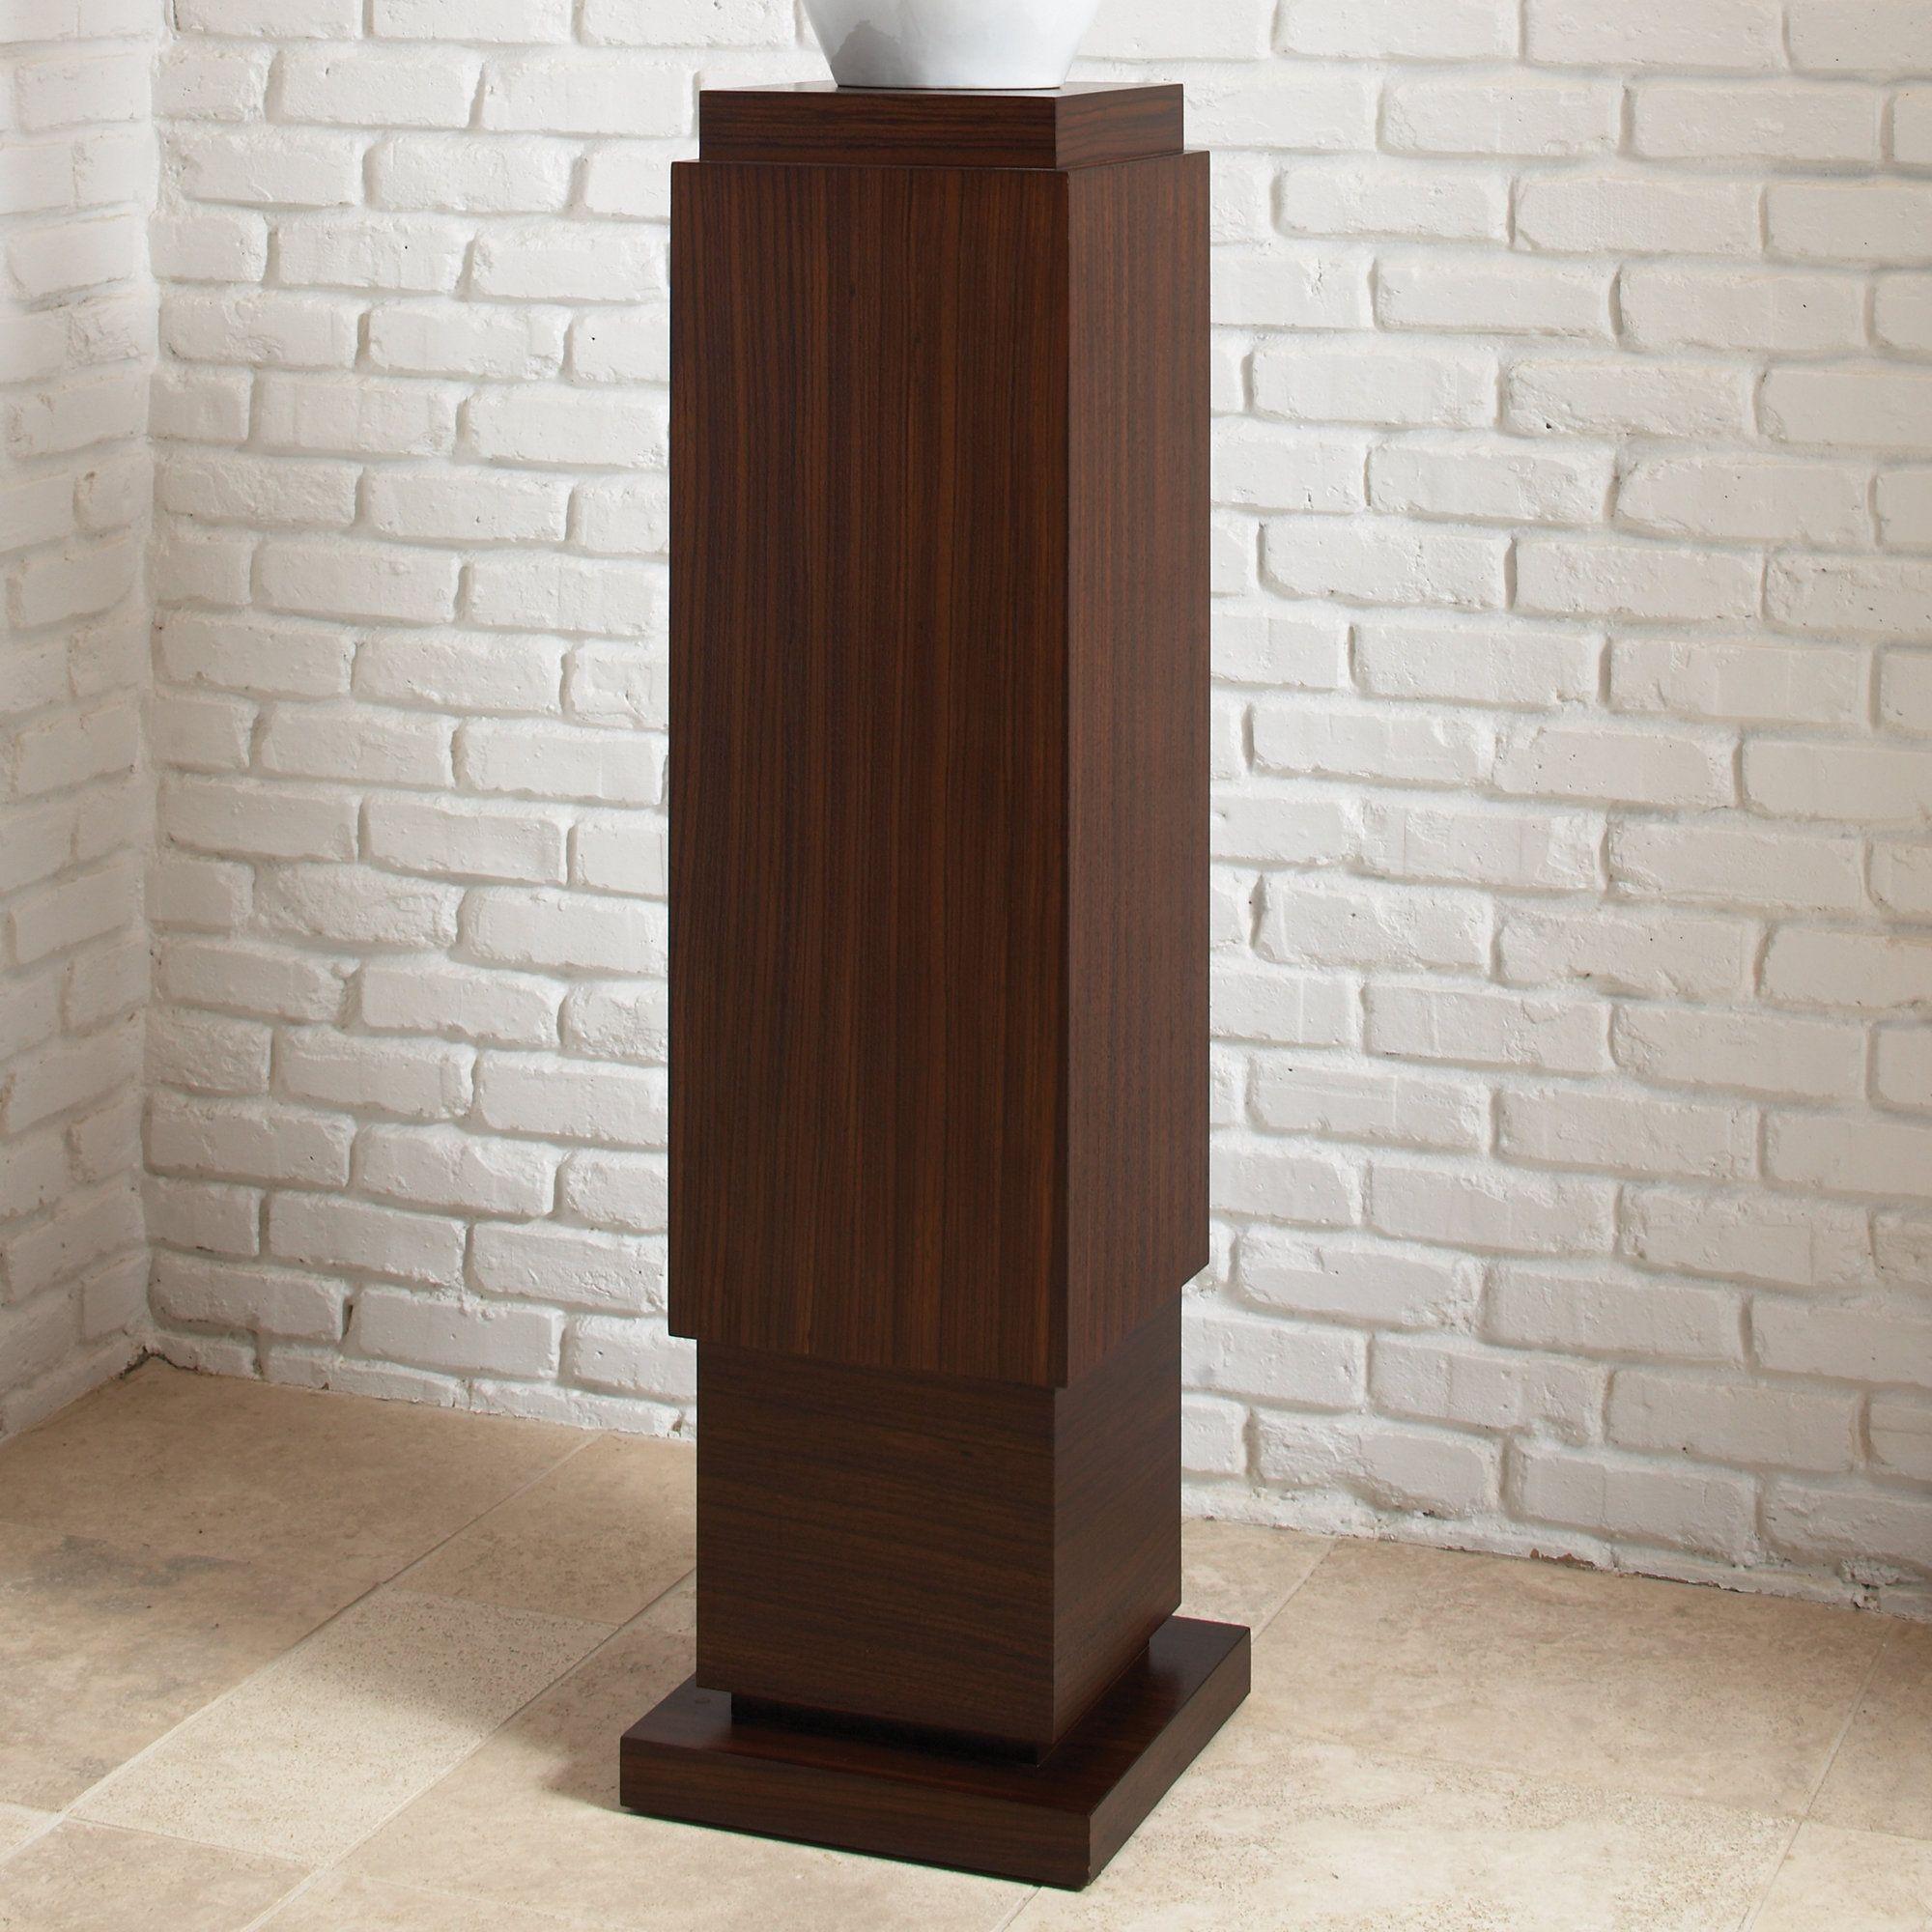 Square Pedestal Plant Stand Wood Pedestal Pedestal Global Views